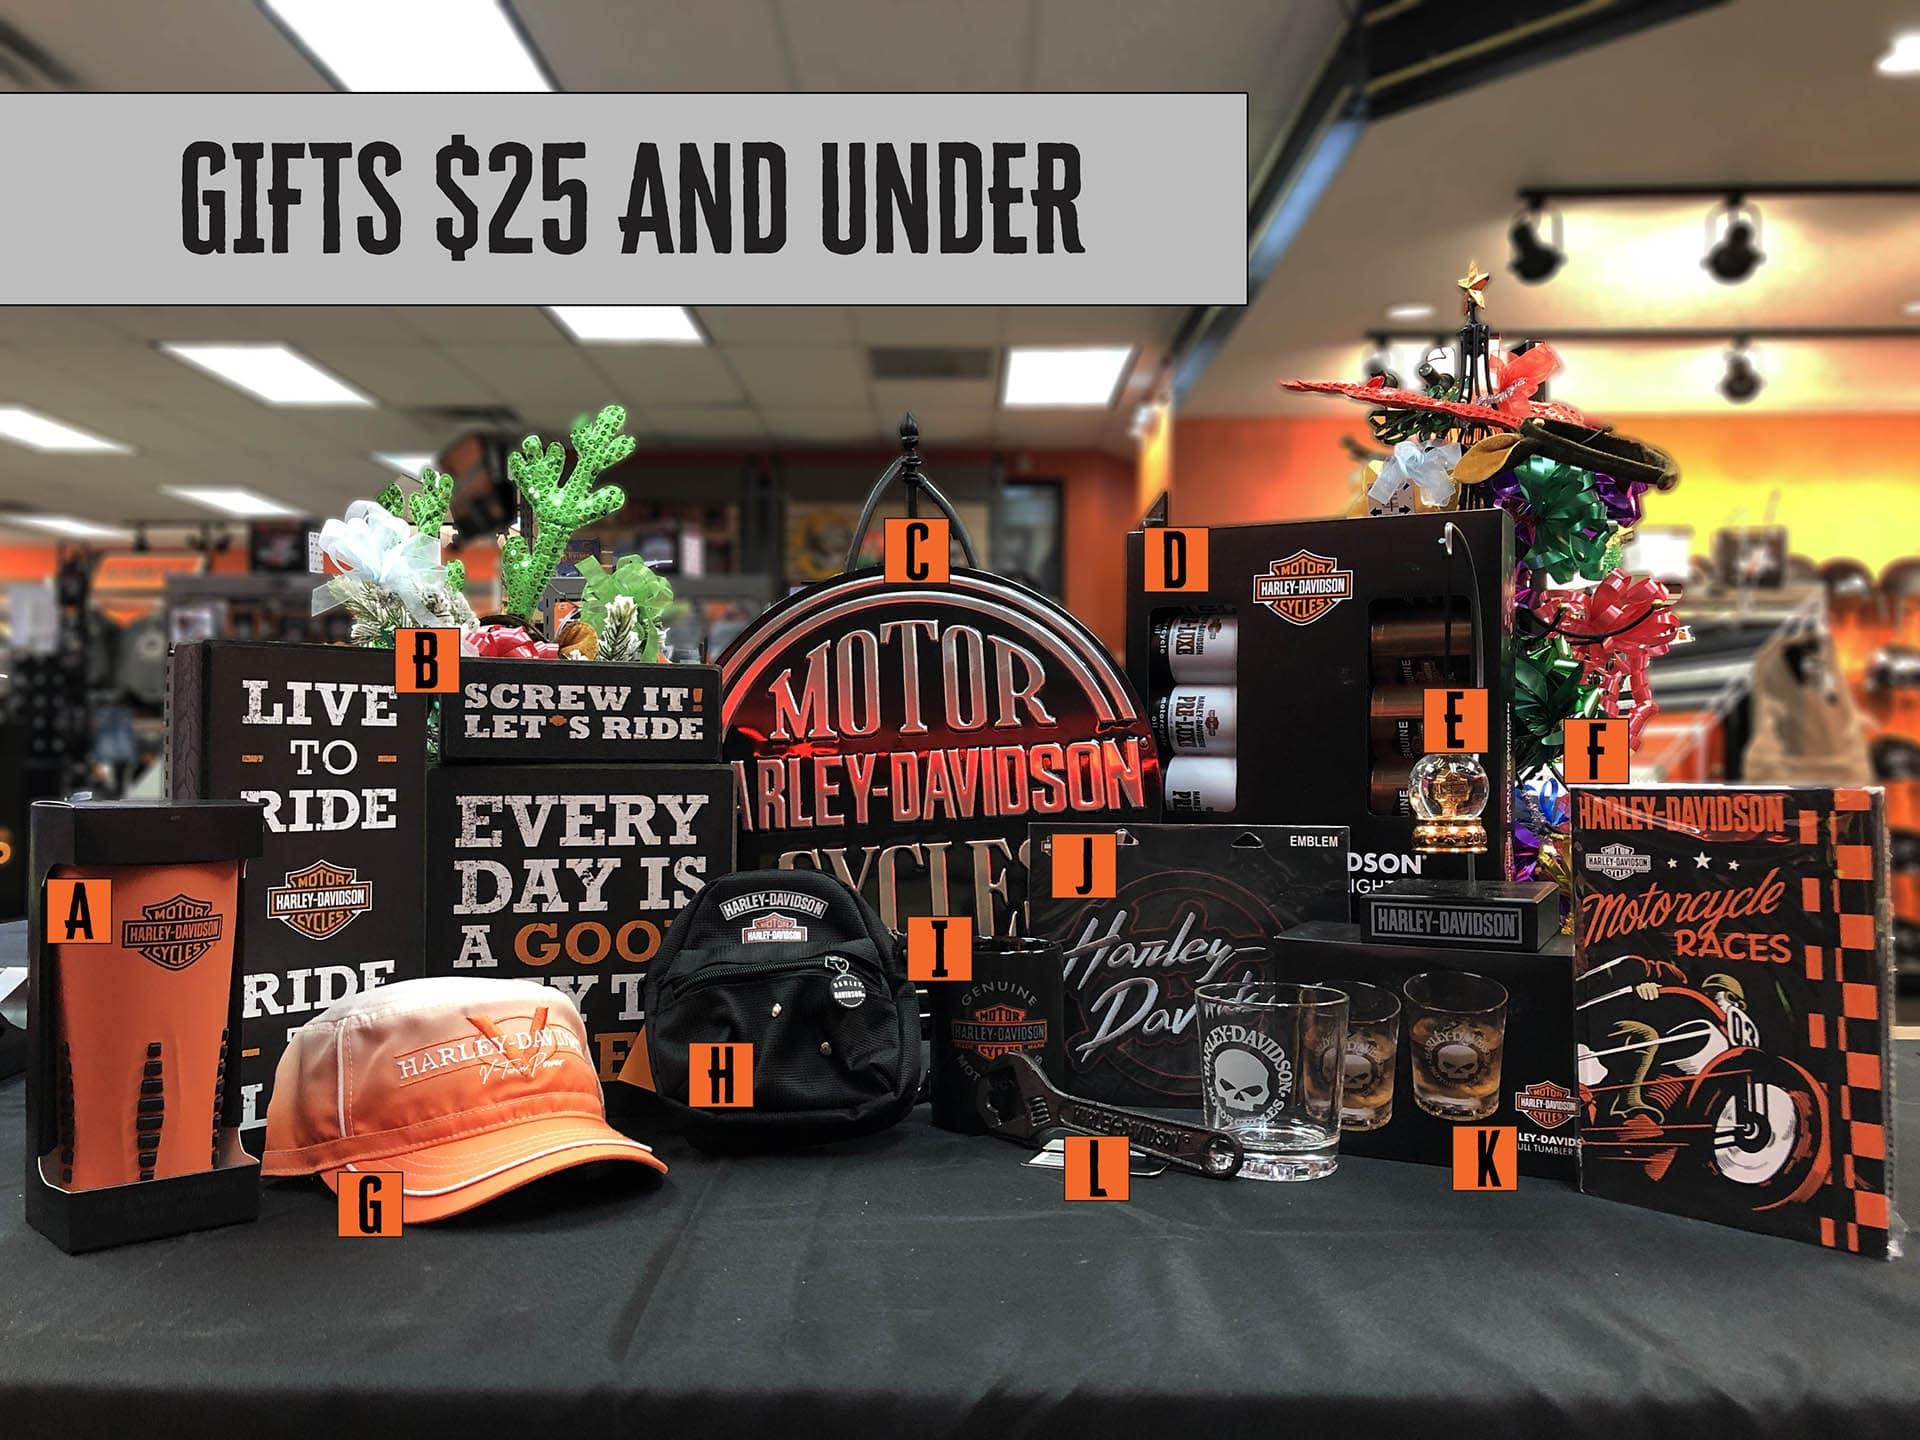 2020 Walk Through Christmas Lights Near Micanopy Fl 2020 Holiday Gift Guide | War Horse Harley Davidson